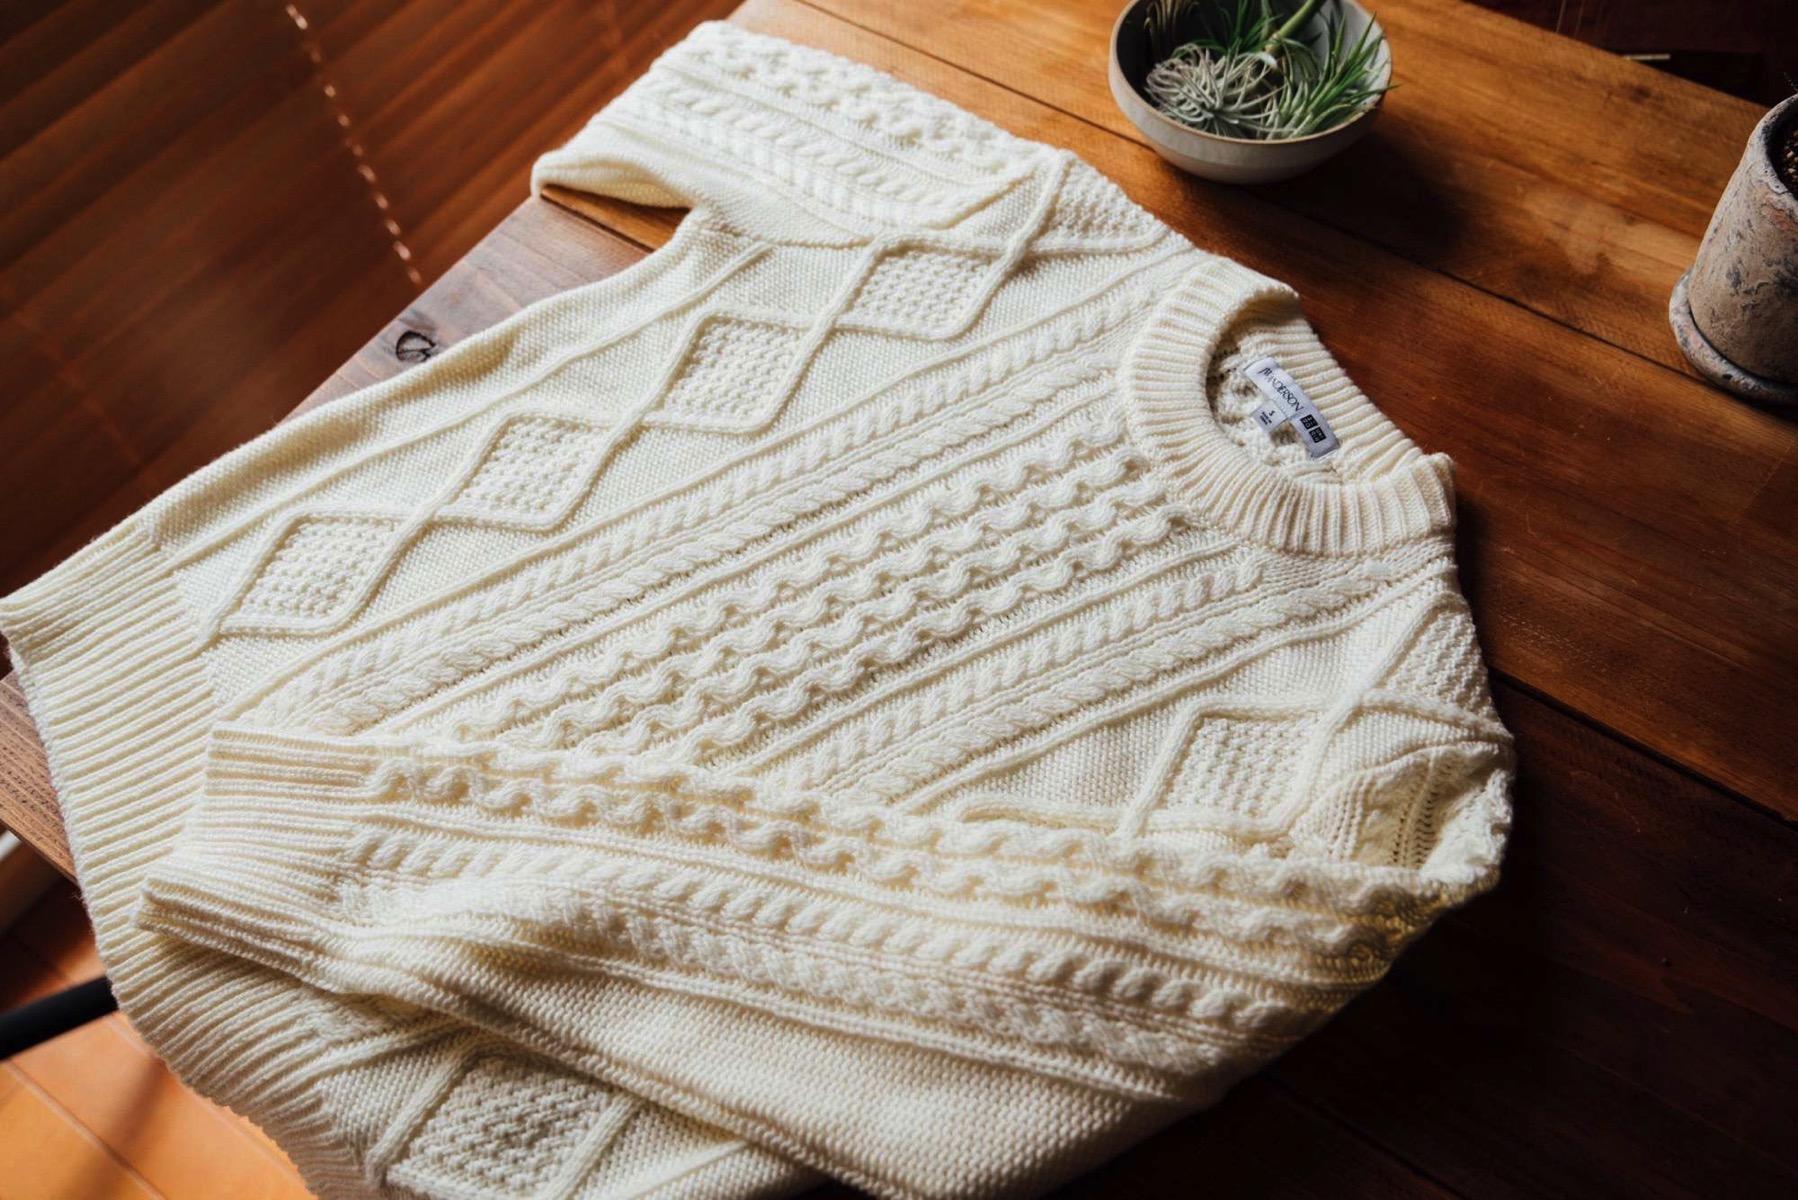 Uniqlo jw anderson wool 2